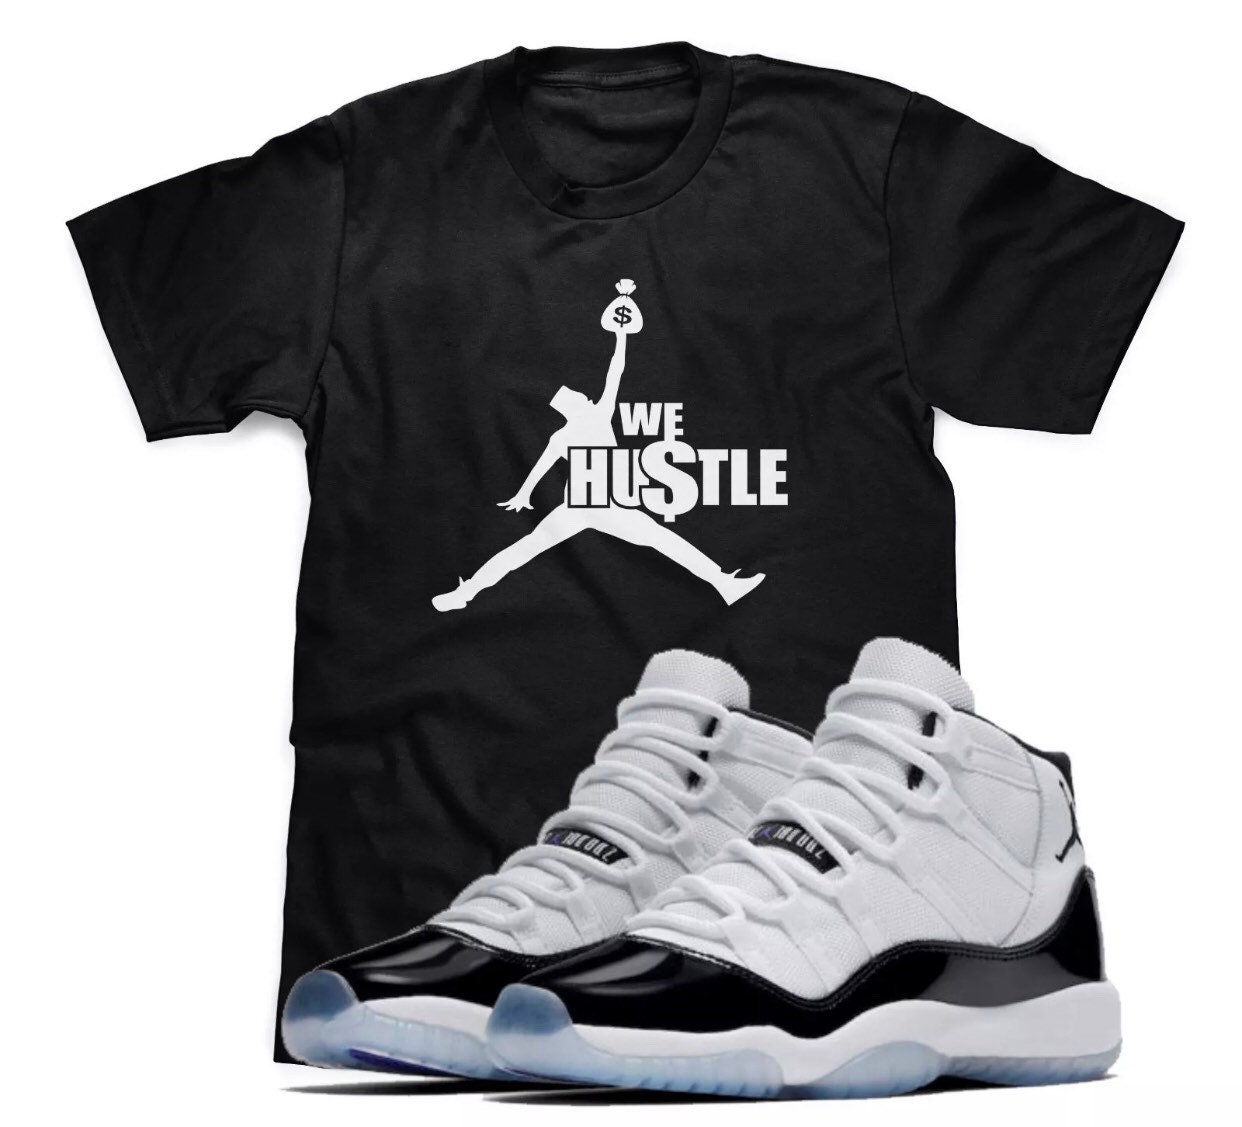 f6f2d29bf32f We Hustle T-Shirt Designed To Match Air Jordan Retro 11 XI